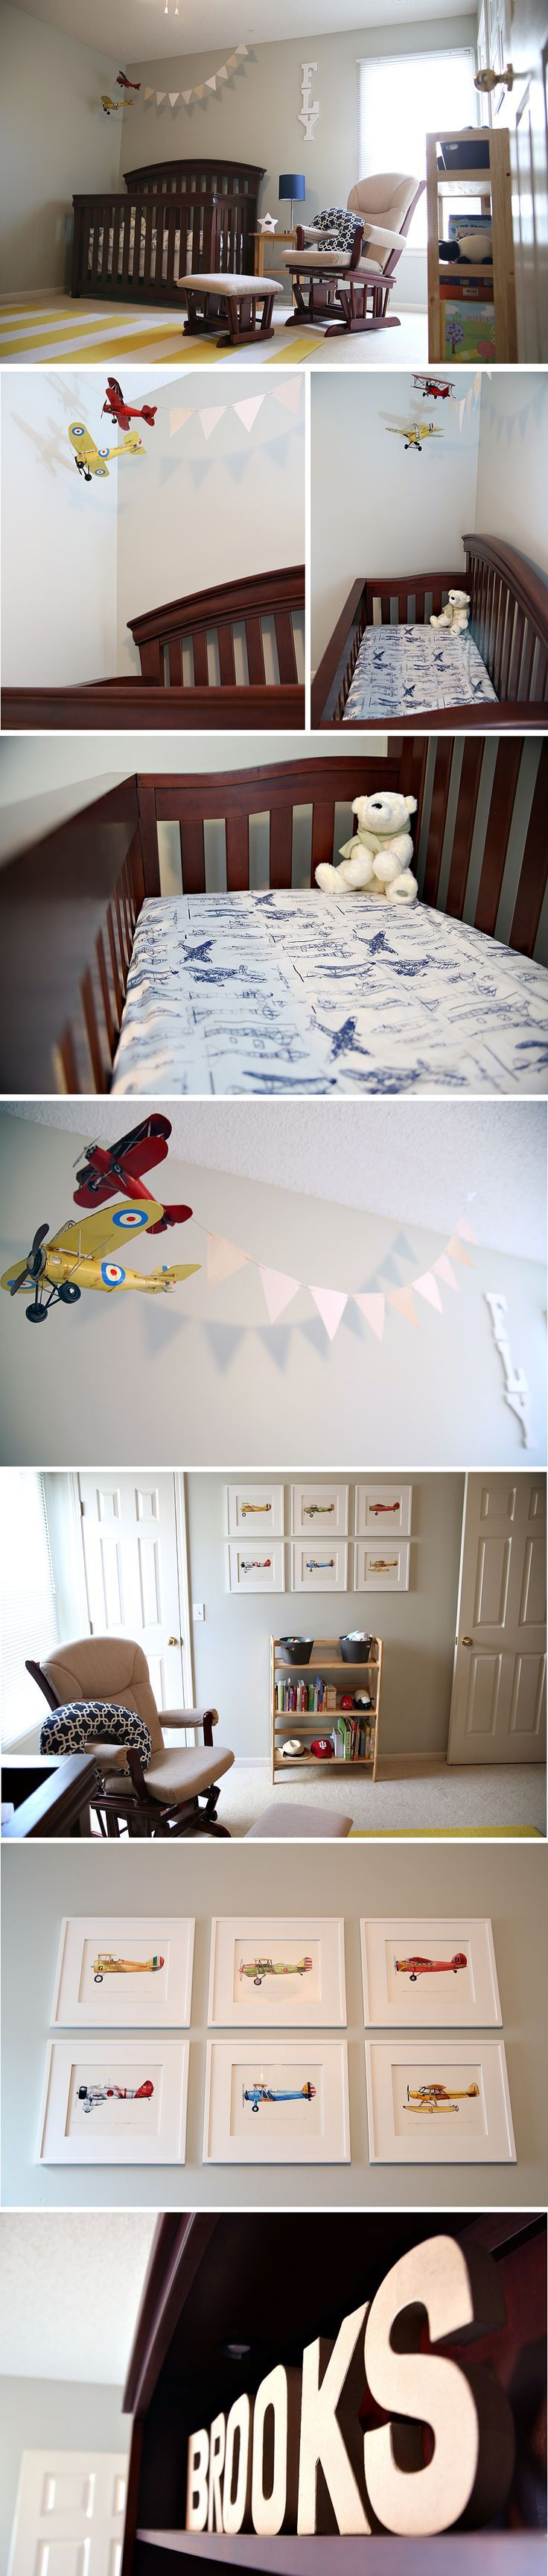 best 25 airplane baby room ideas on pinterest airplane room